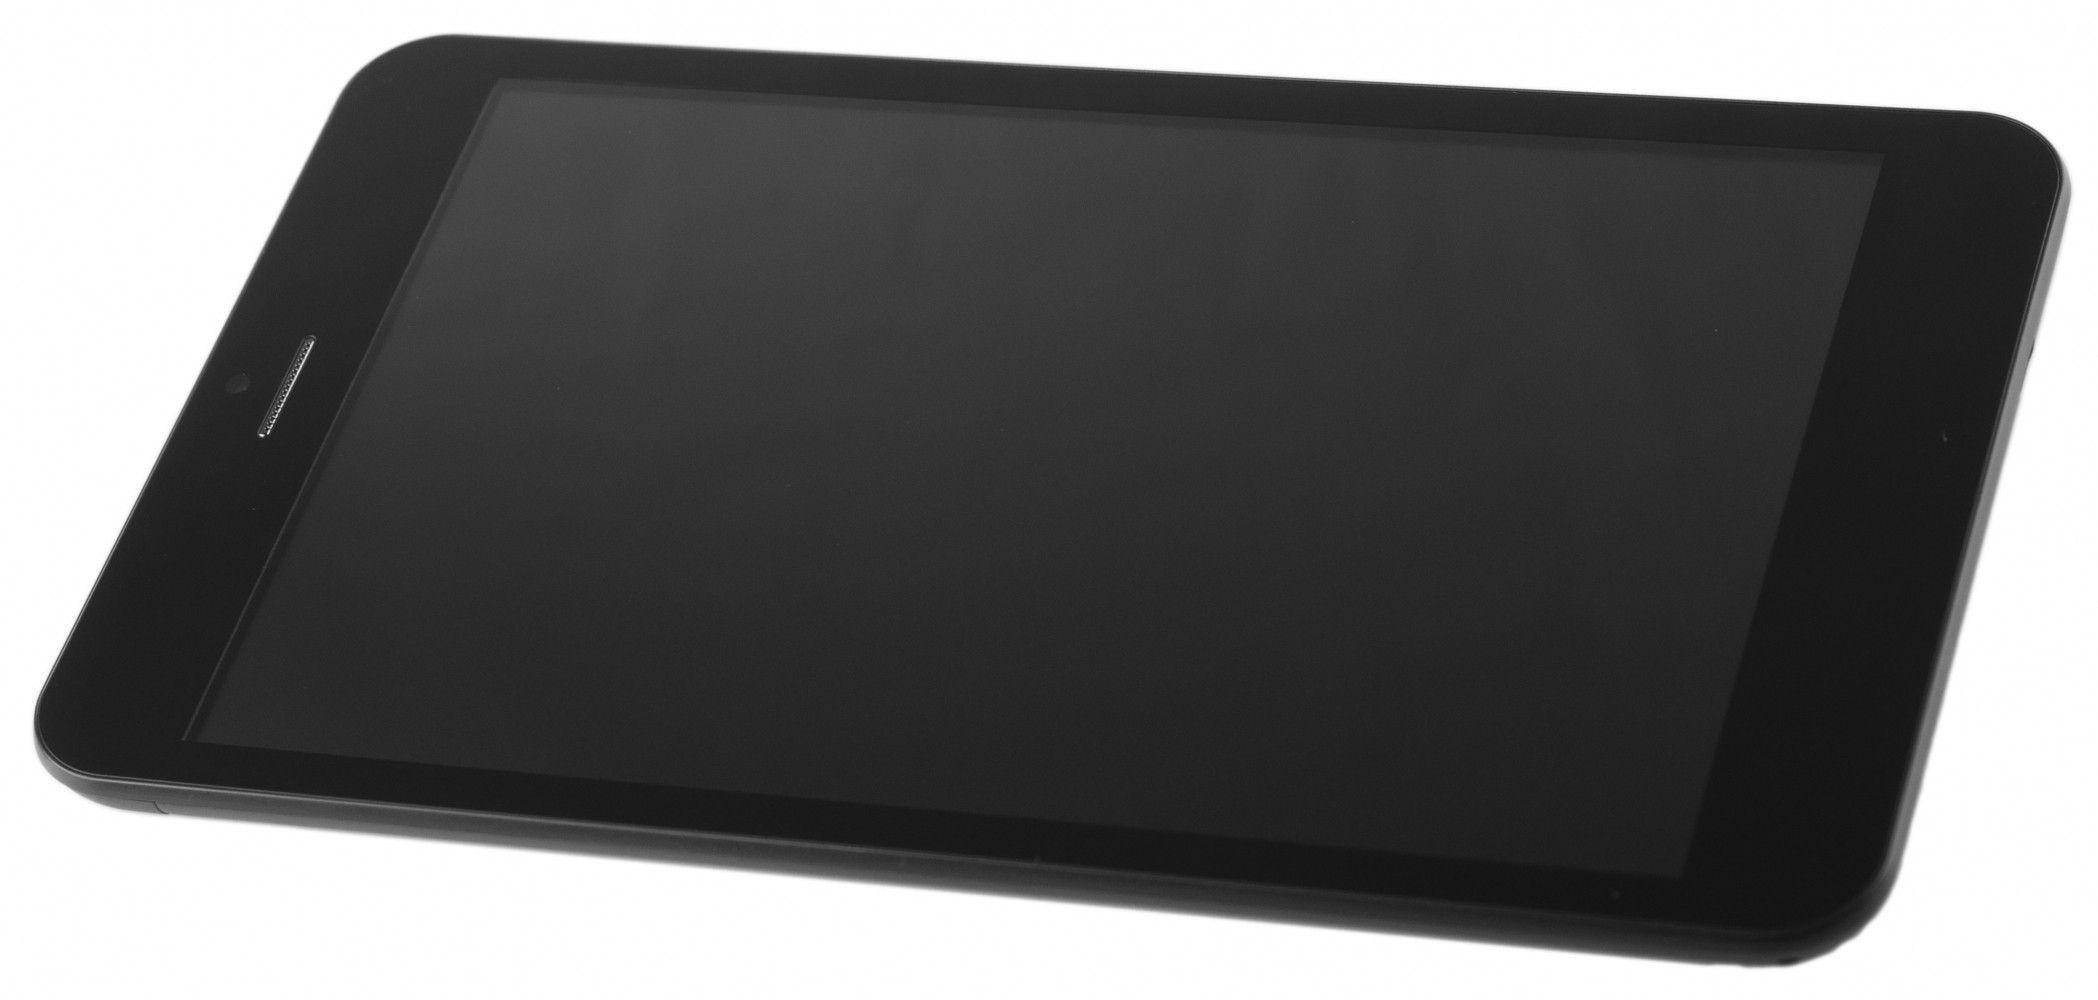 Планшет Globex X8 GU8012C - 3